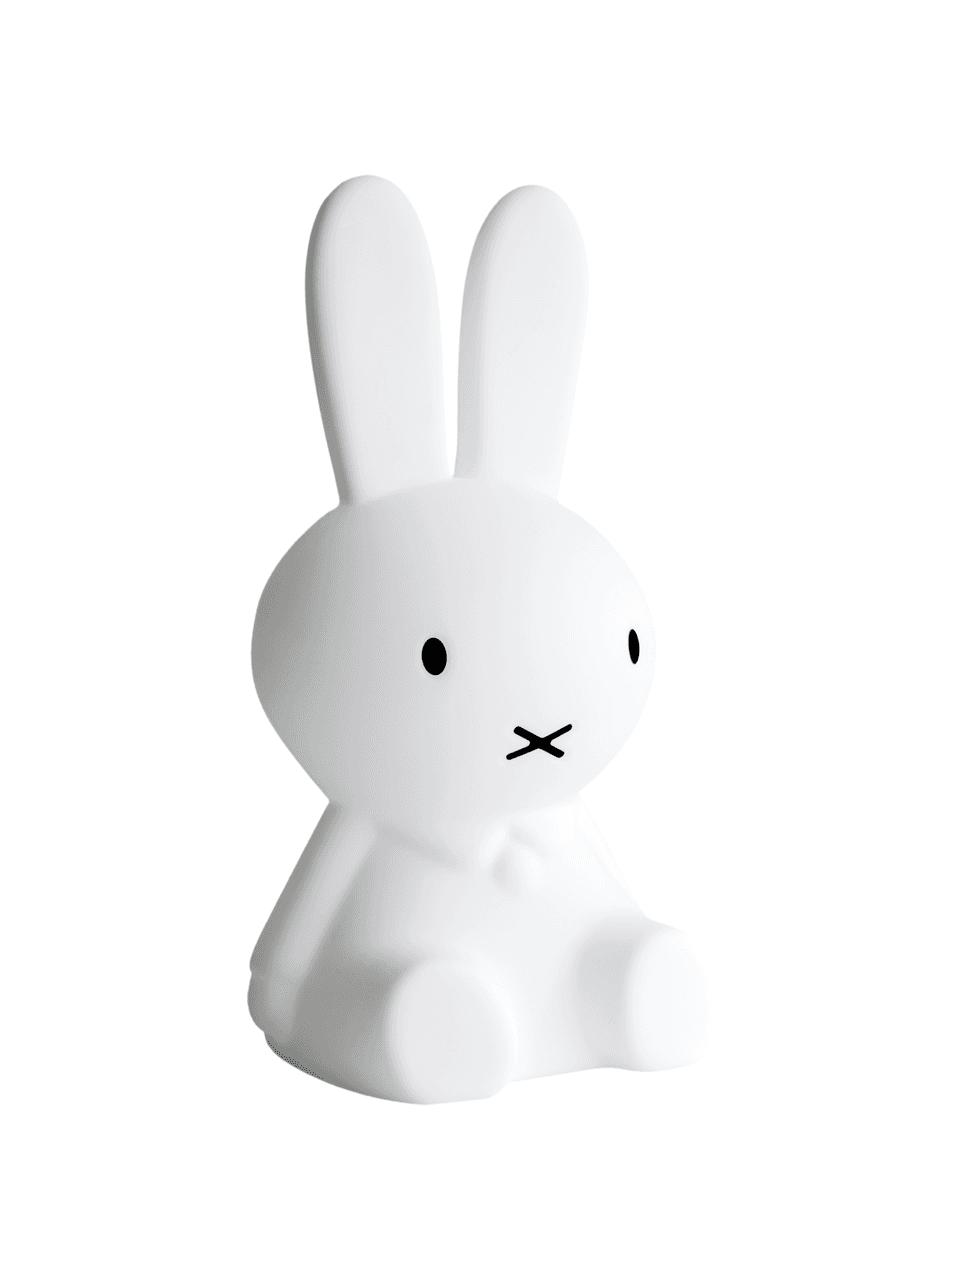 LED-Bodenleuchte Miffy, Polyethylen, Weiß, 25 x 50 cm